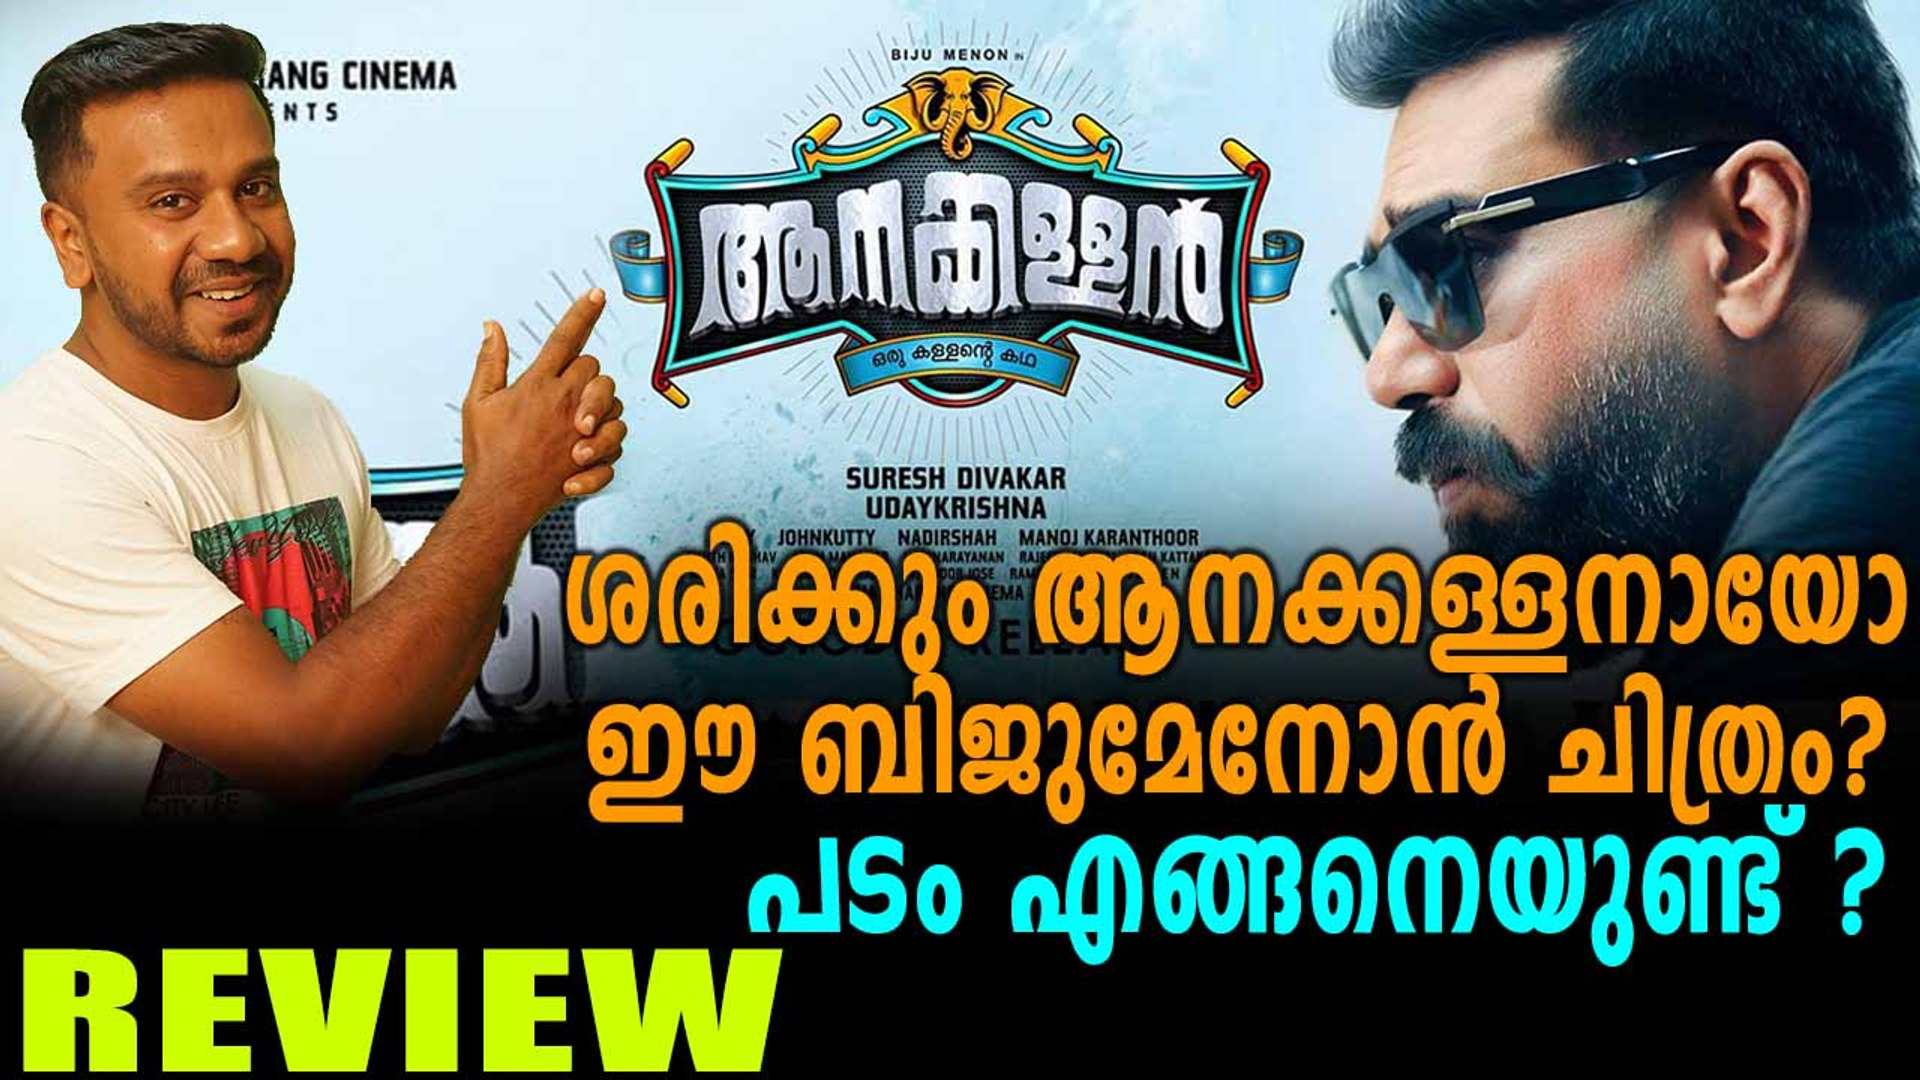 Aanakallan malayalam movie review | Movie Review | FilmiBeat Malayalam